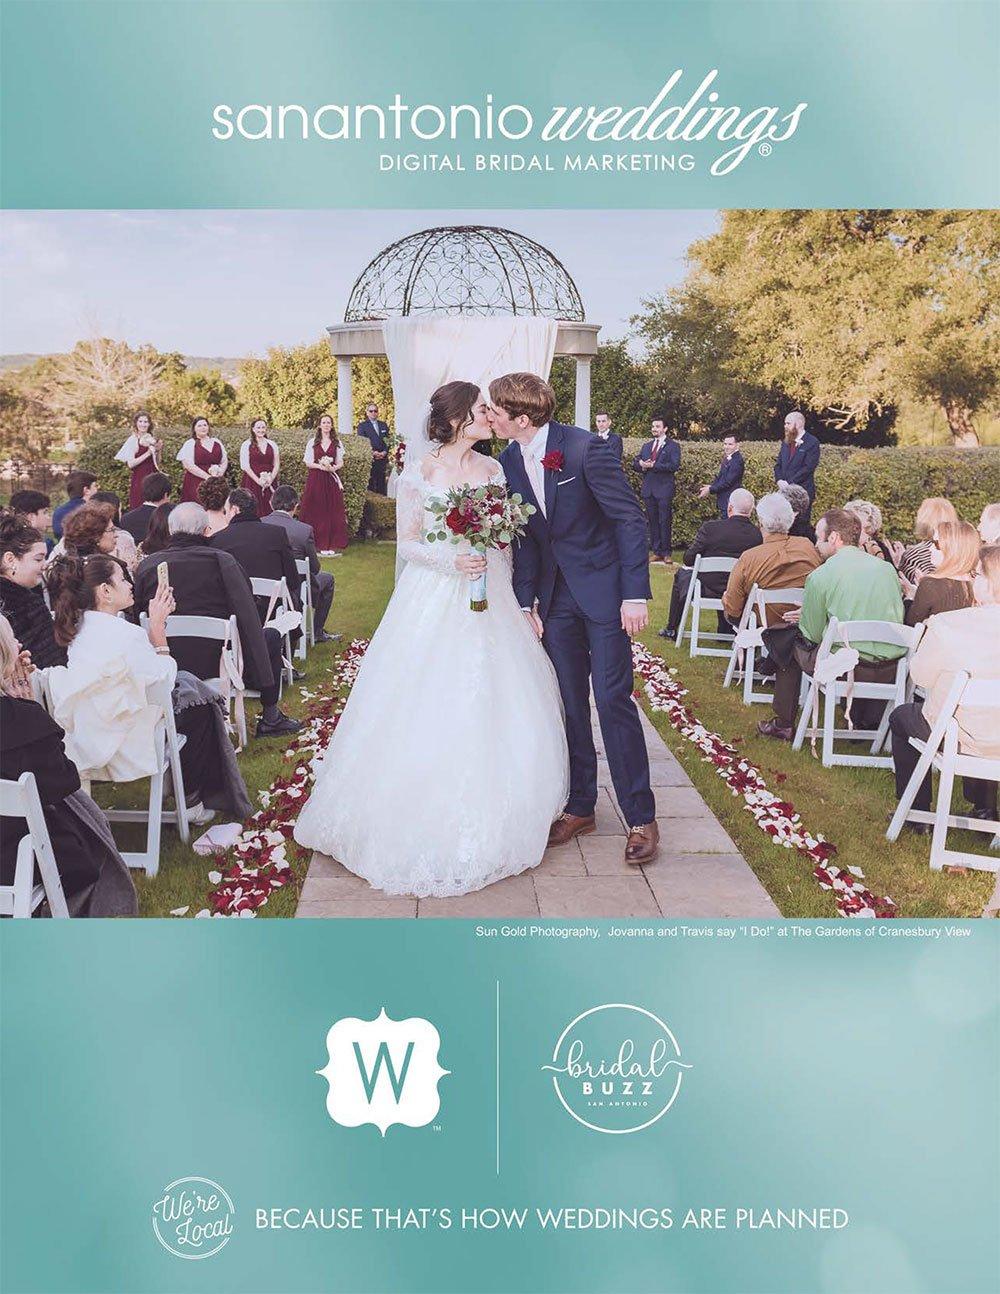 San Antonio Weddings Digital Media Kit